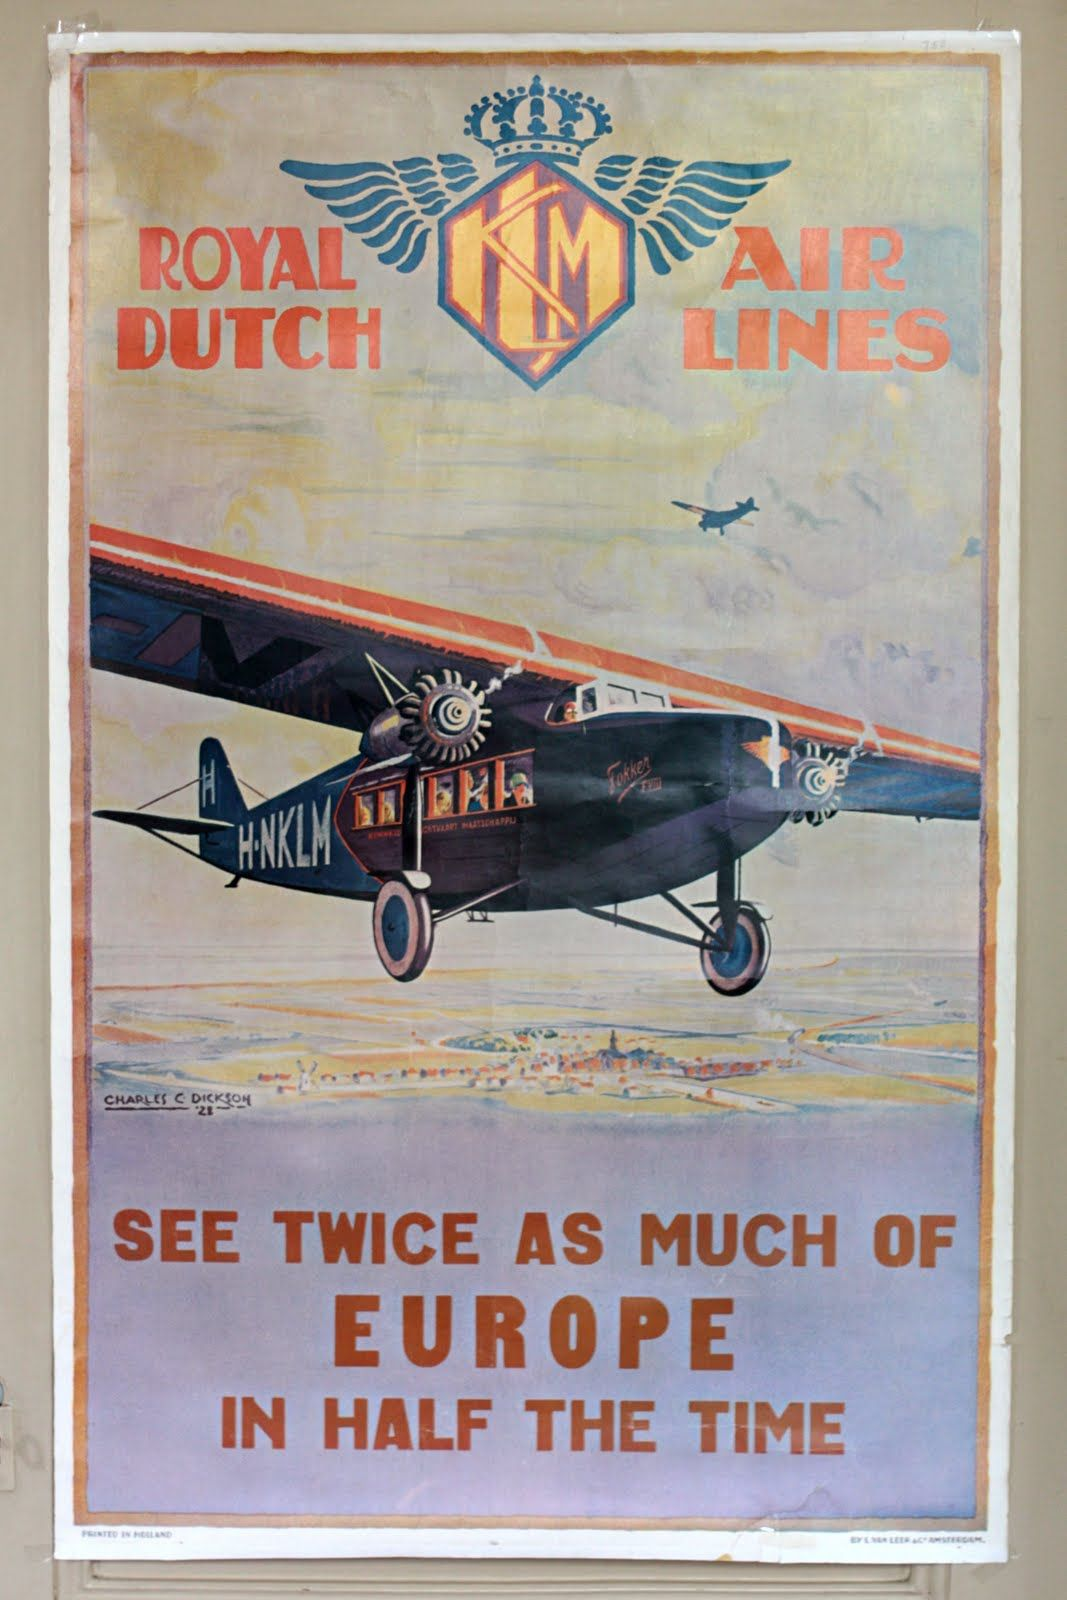 Vintage Travel Poster - Europe - (KLM = Royal Dutch Airlines).